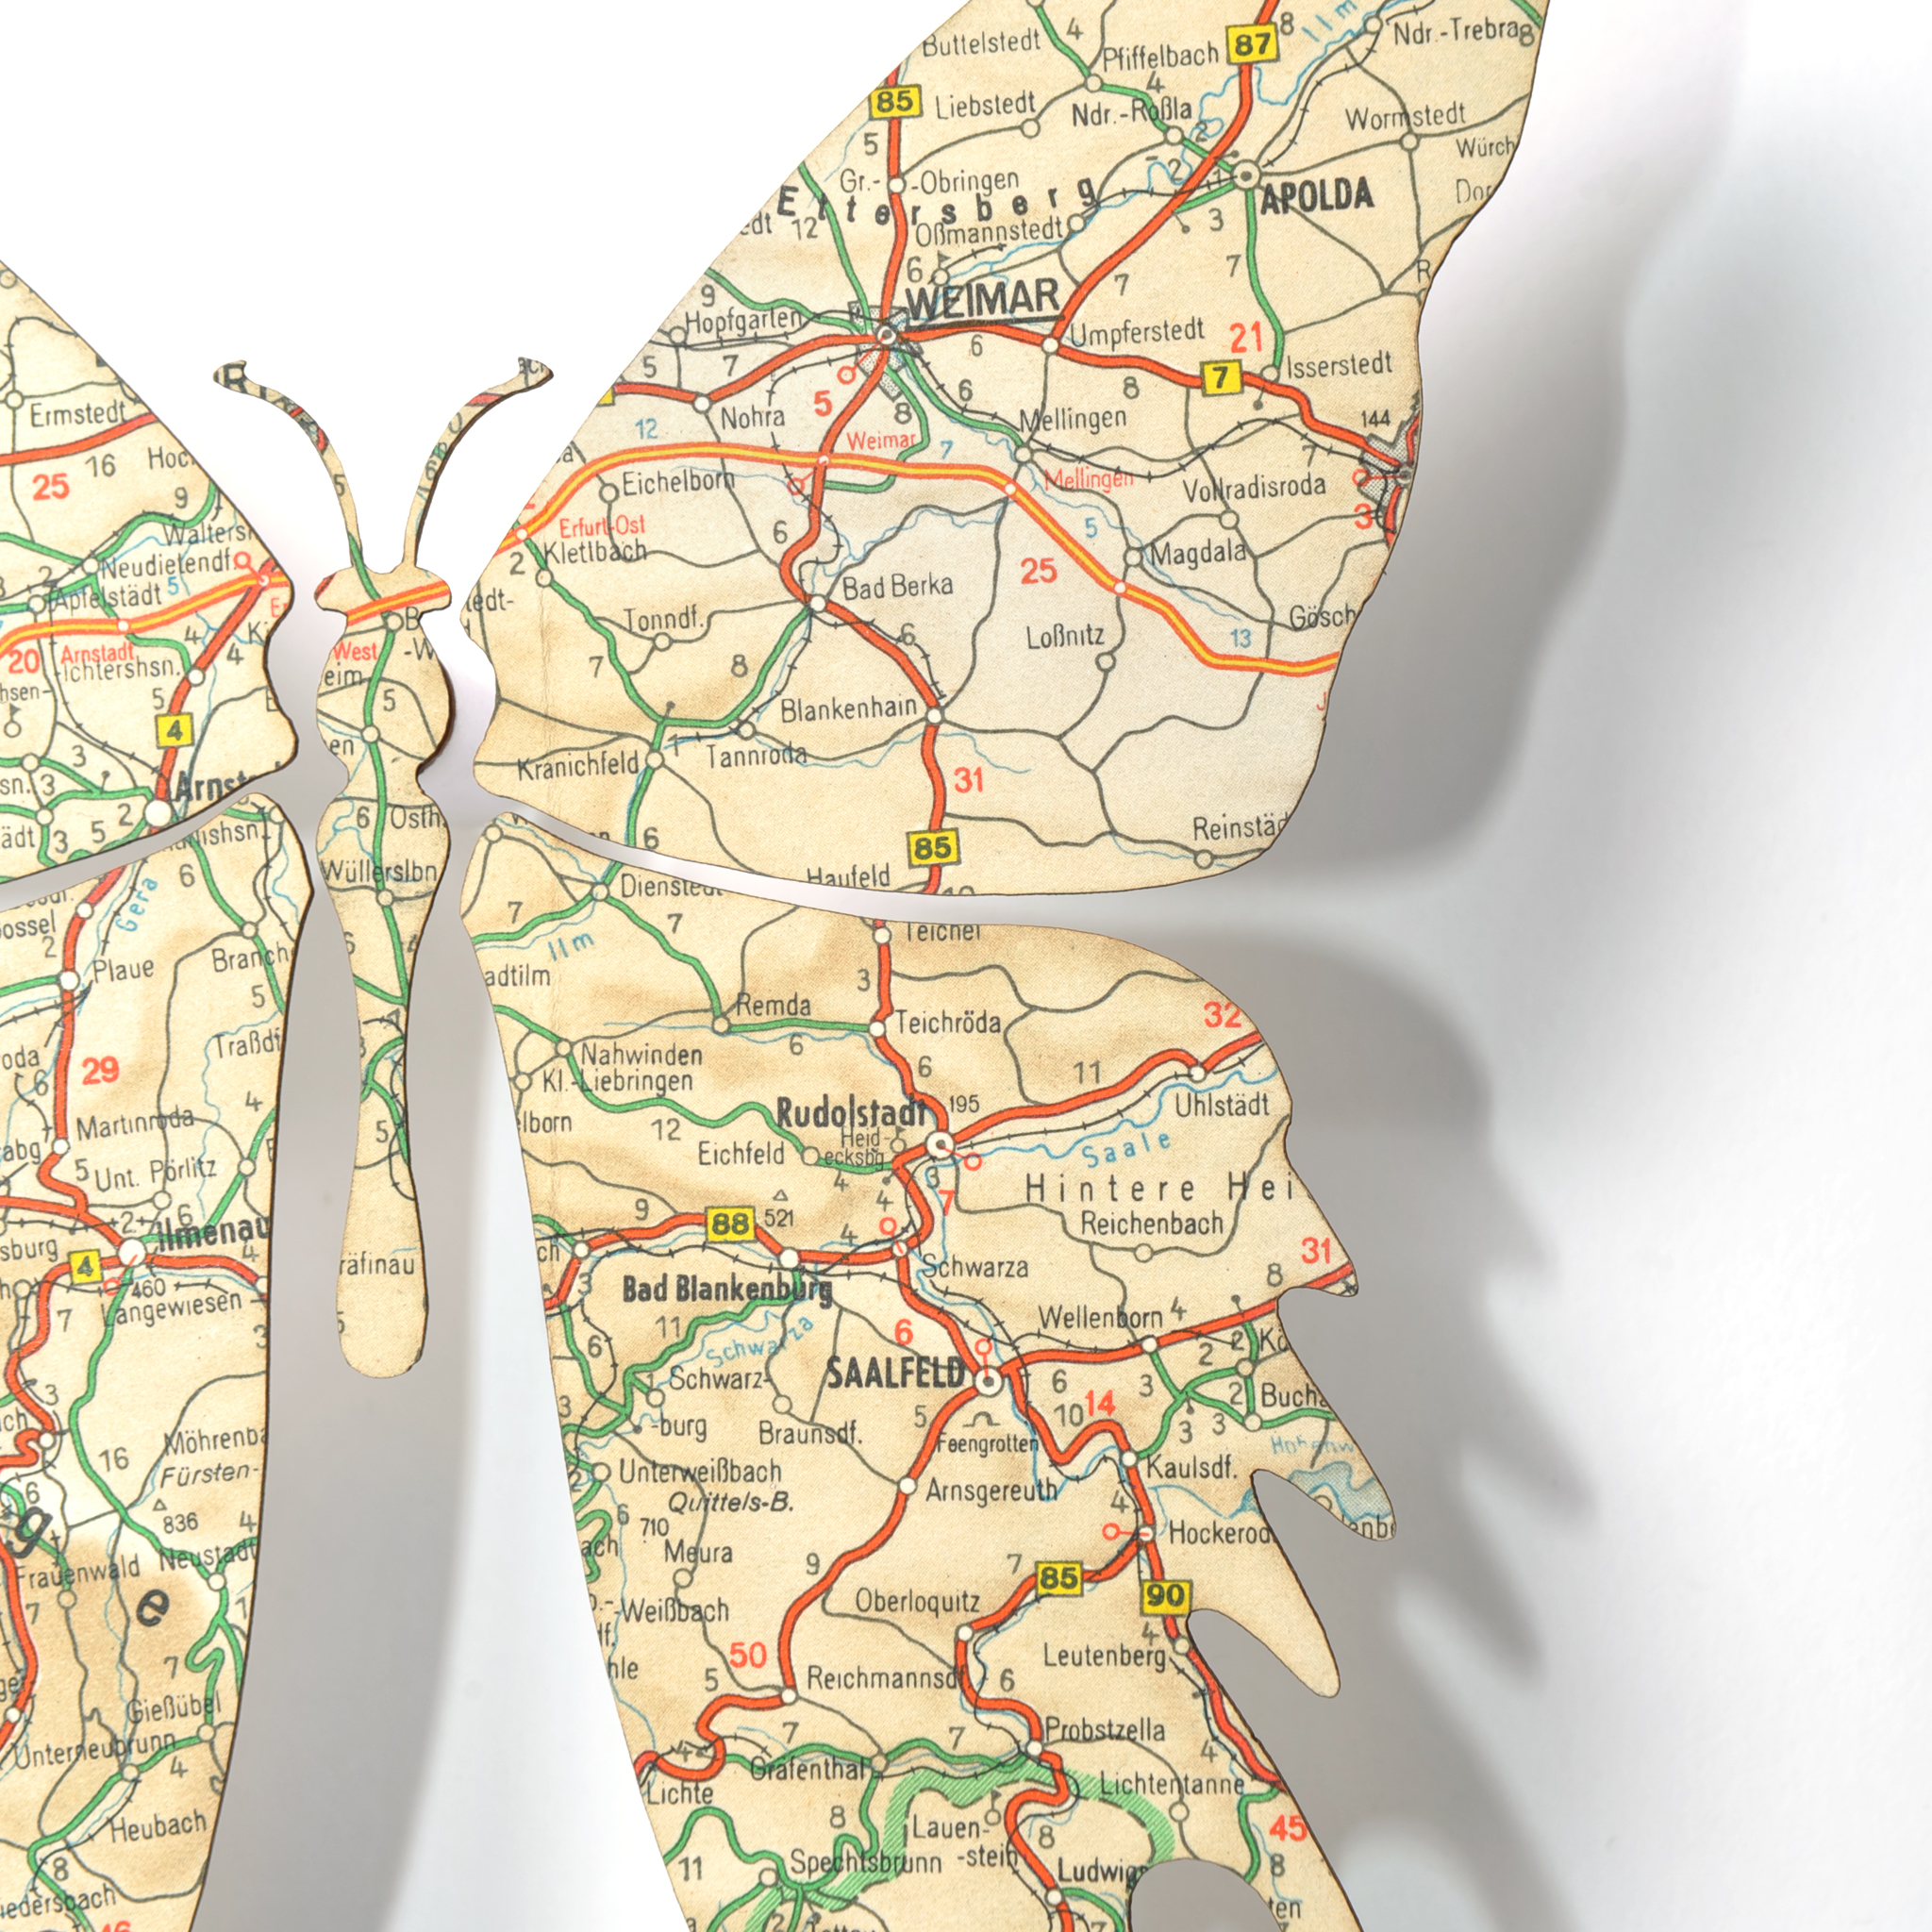 butterfly-effect-map-detail-artwork